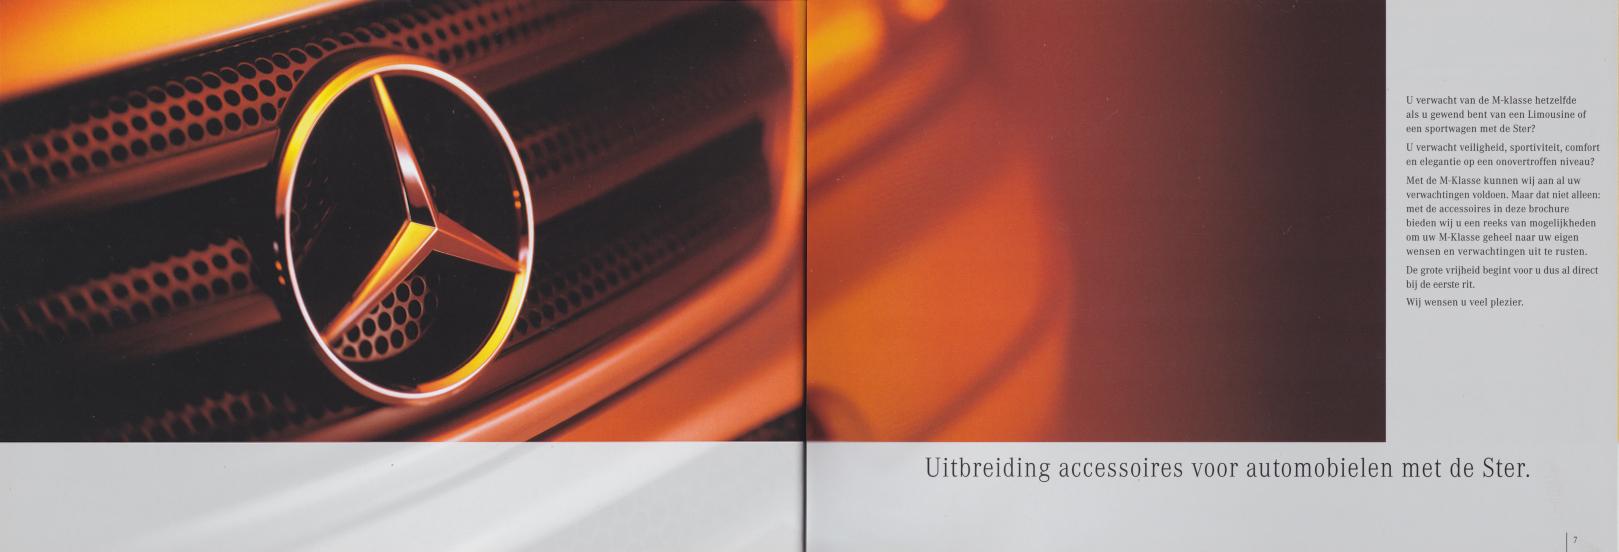 (W163): Catálogo 2001 - acessórios - neerlandês 004